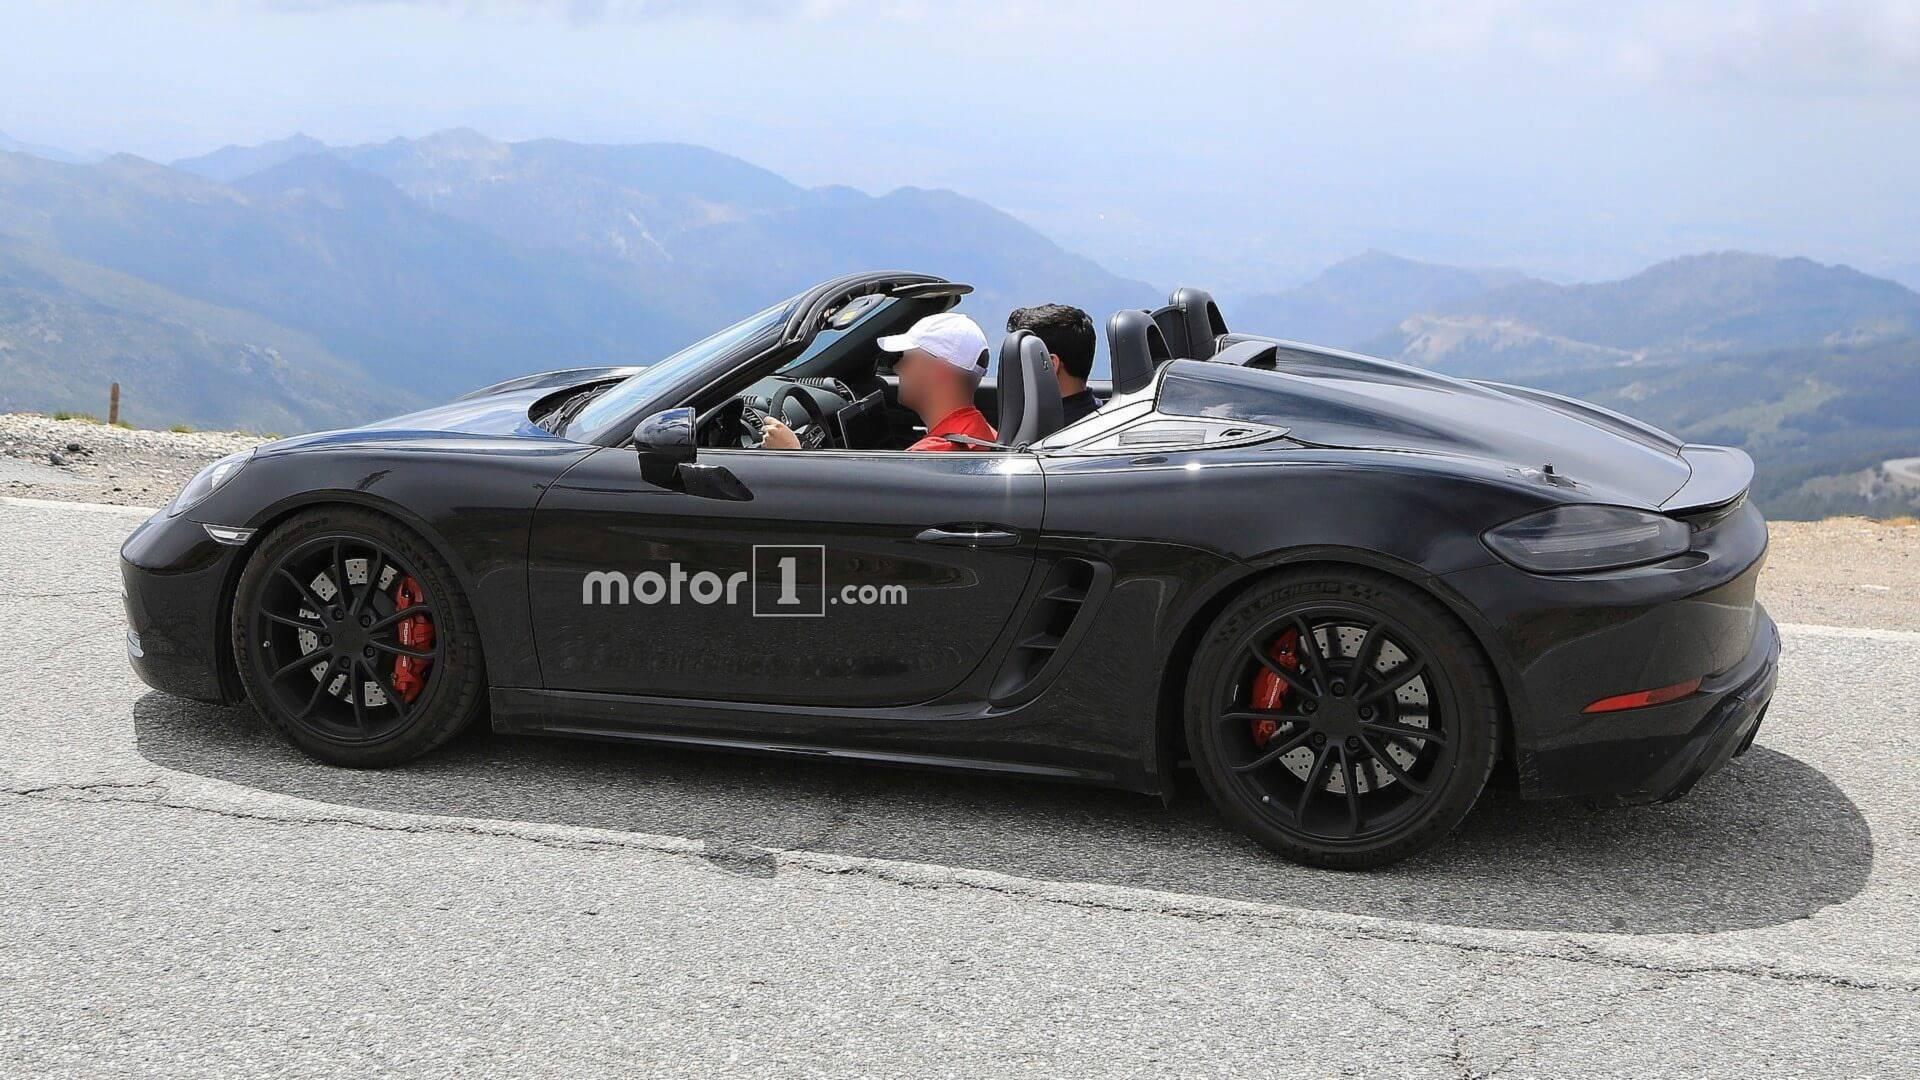 2016 - [Porsche] 718 Boxster & 718 Cayman [982] - Page 7 2019-porsche-718-boxster-spyder-spy-photo